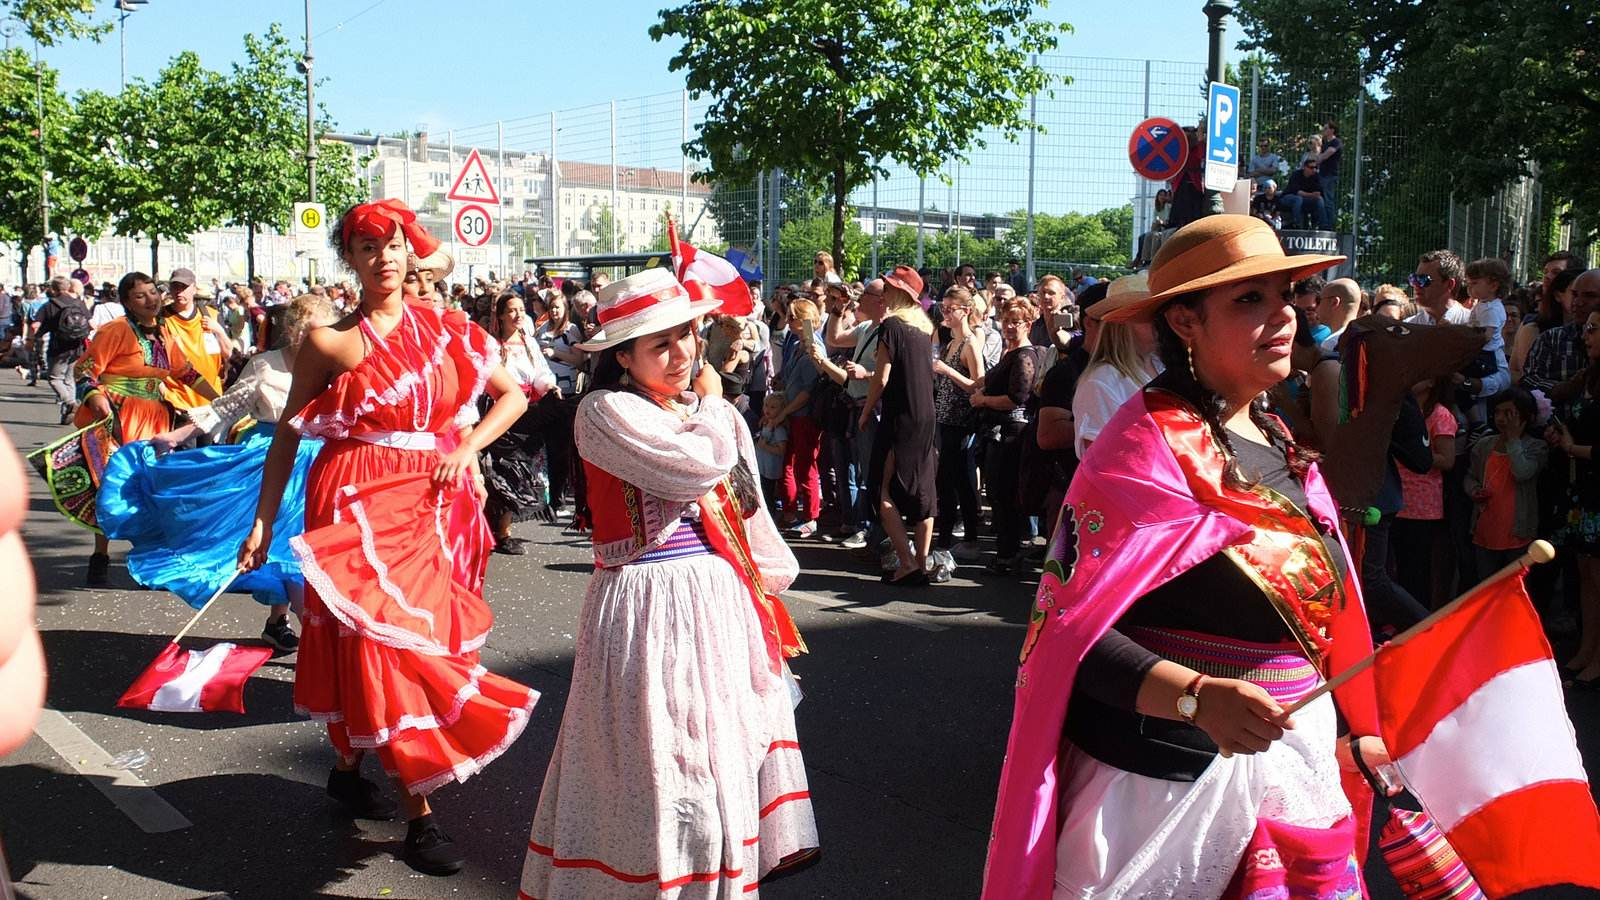 karnevalderkulturen11 KdK   Karneval der Kulturen in Berlin (Carnival of Cultures)